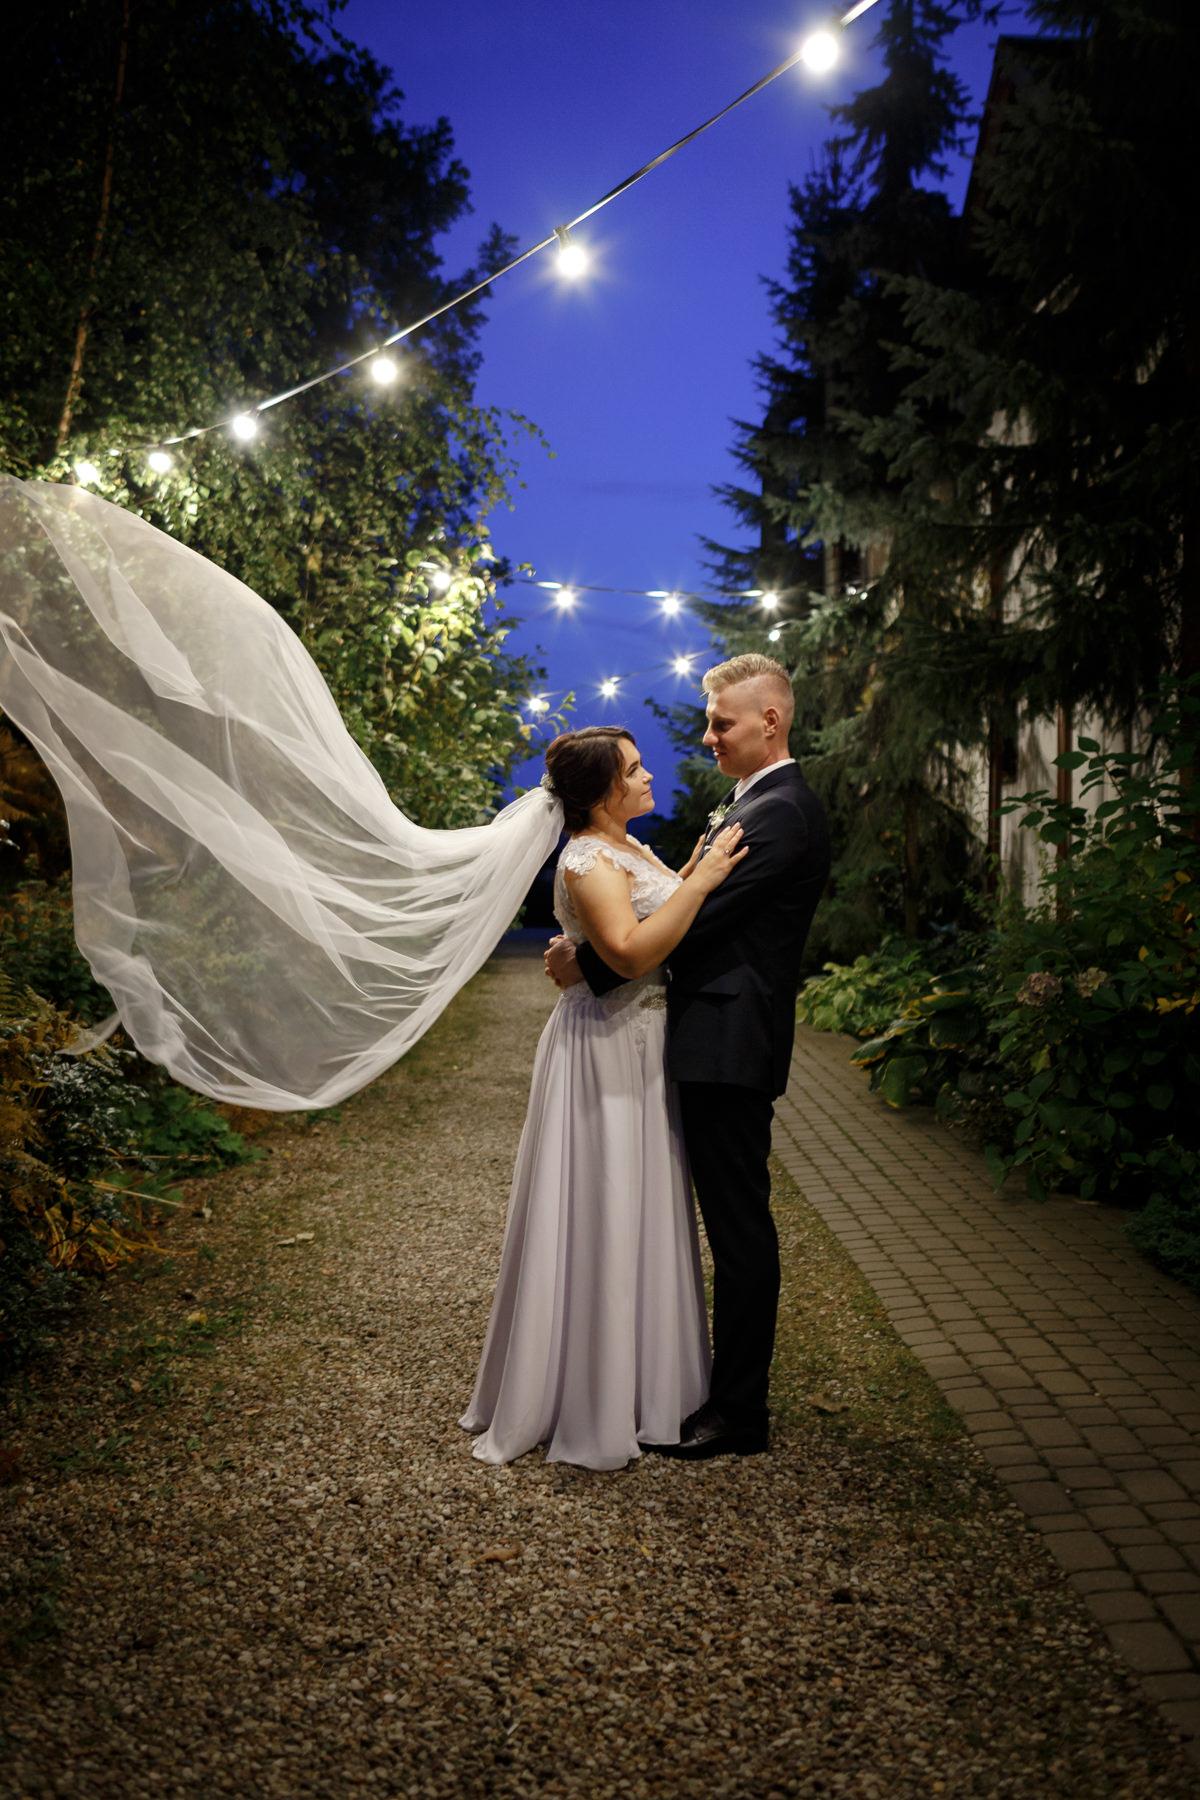 kurdunowicz-fotografia-wesele-folwark-dajak074